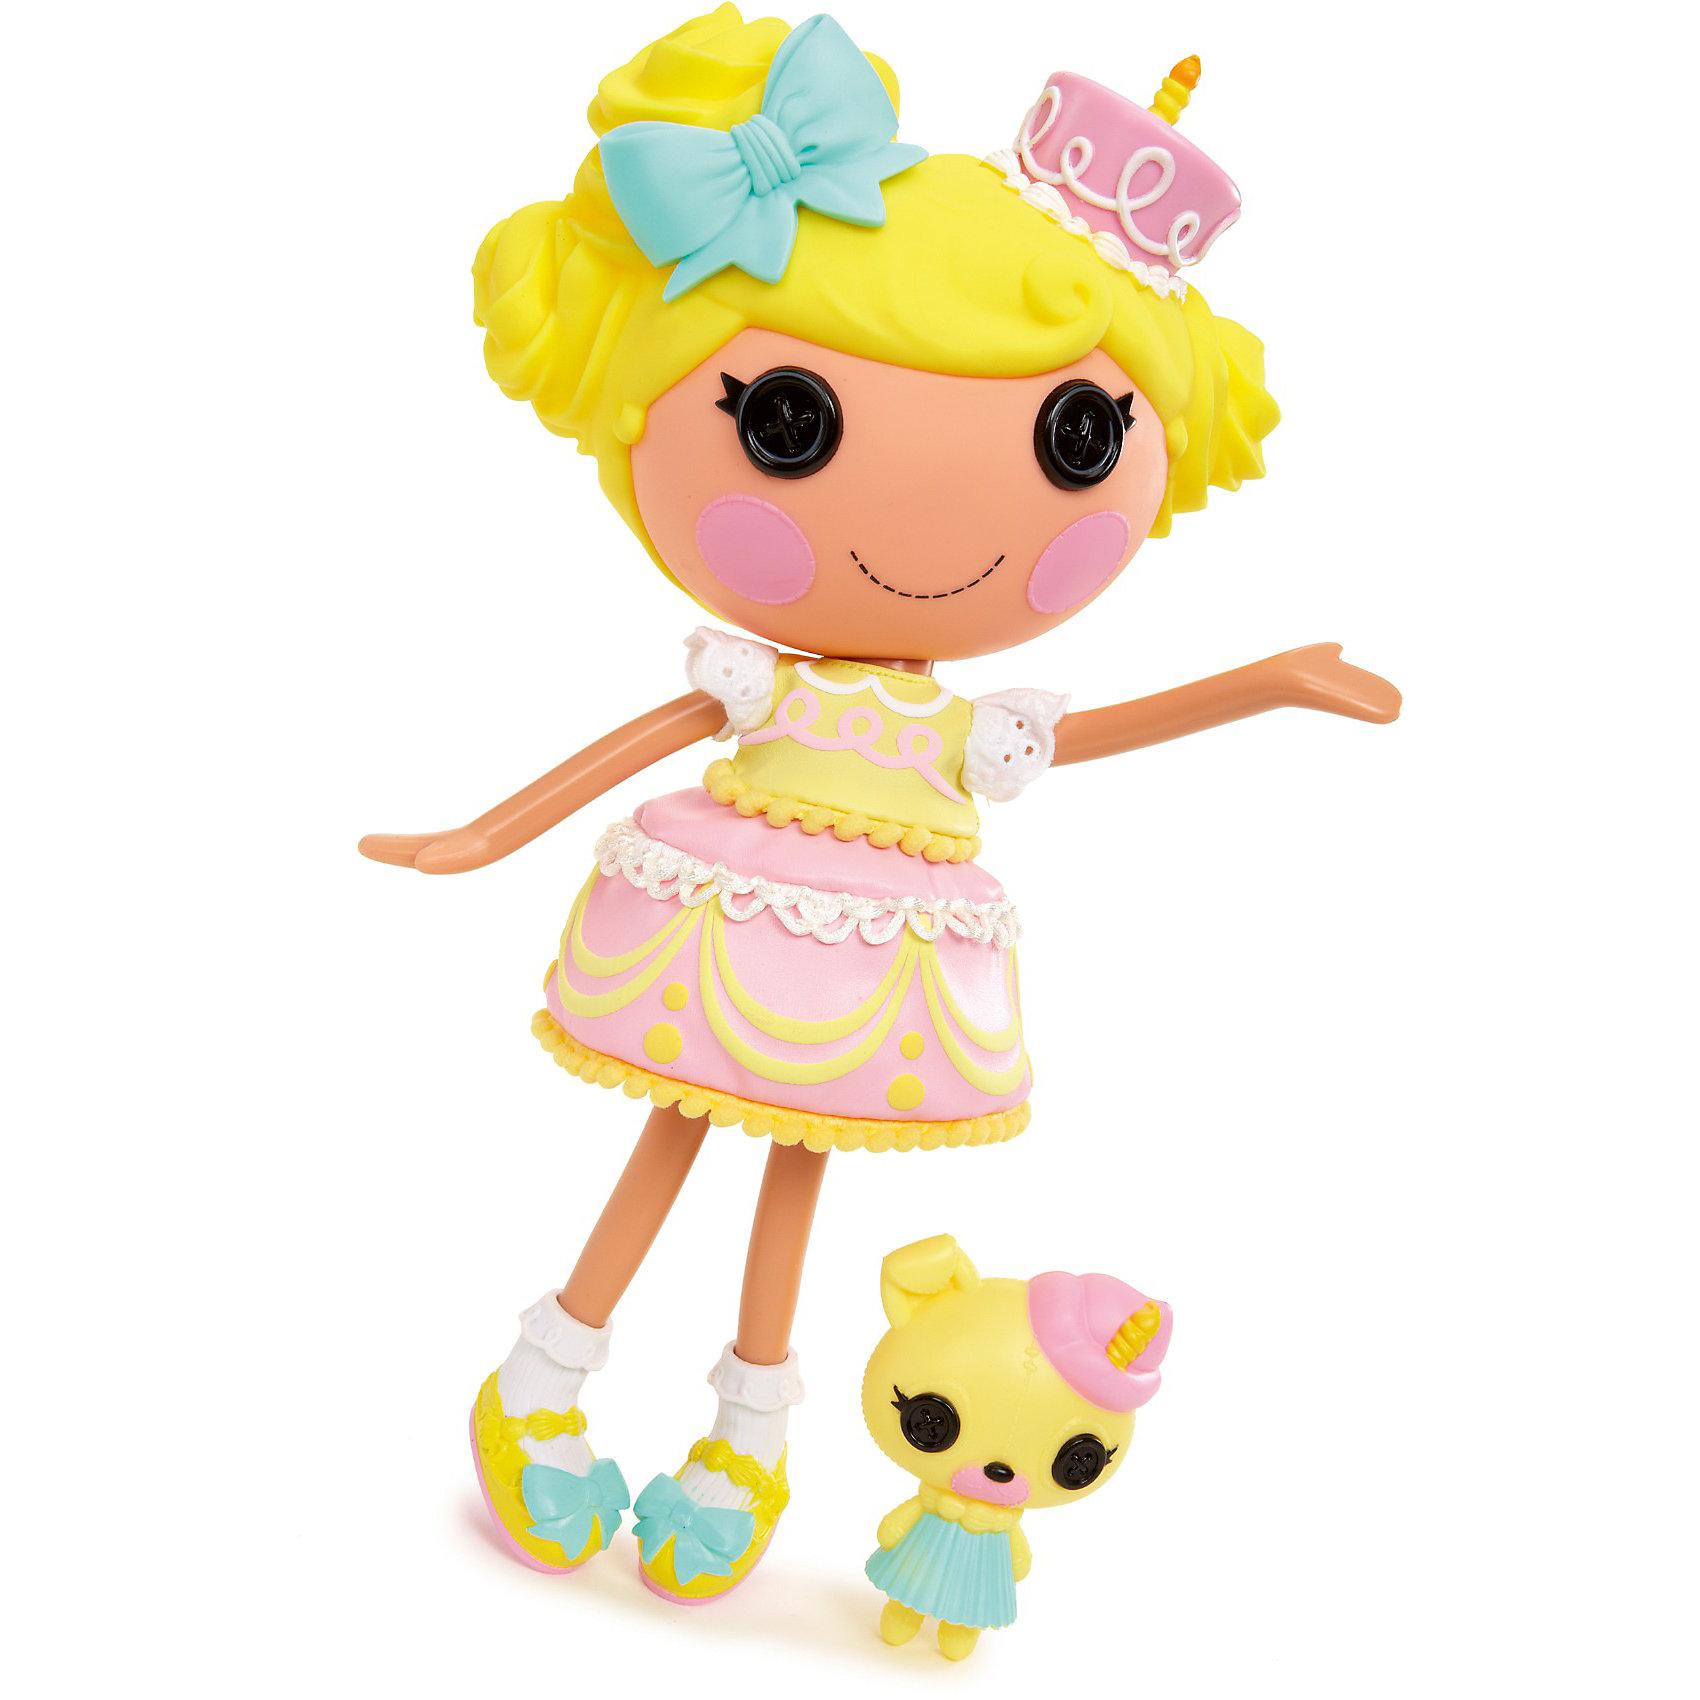 Кукла Пироженка, Lalaloopsy